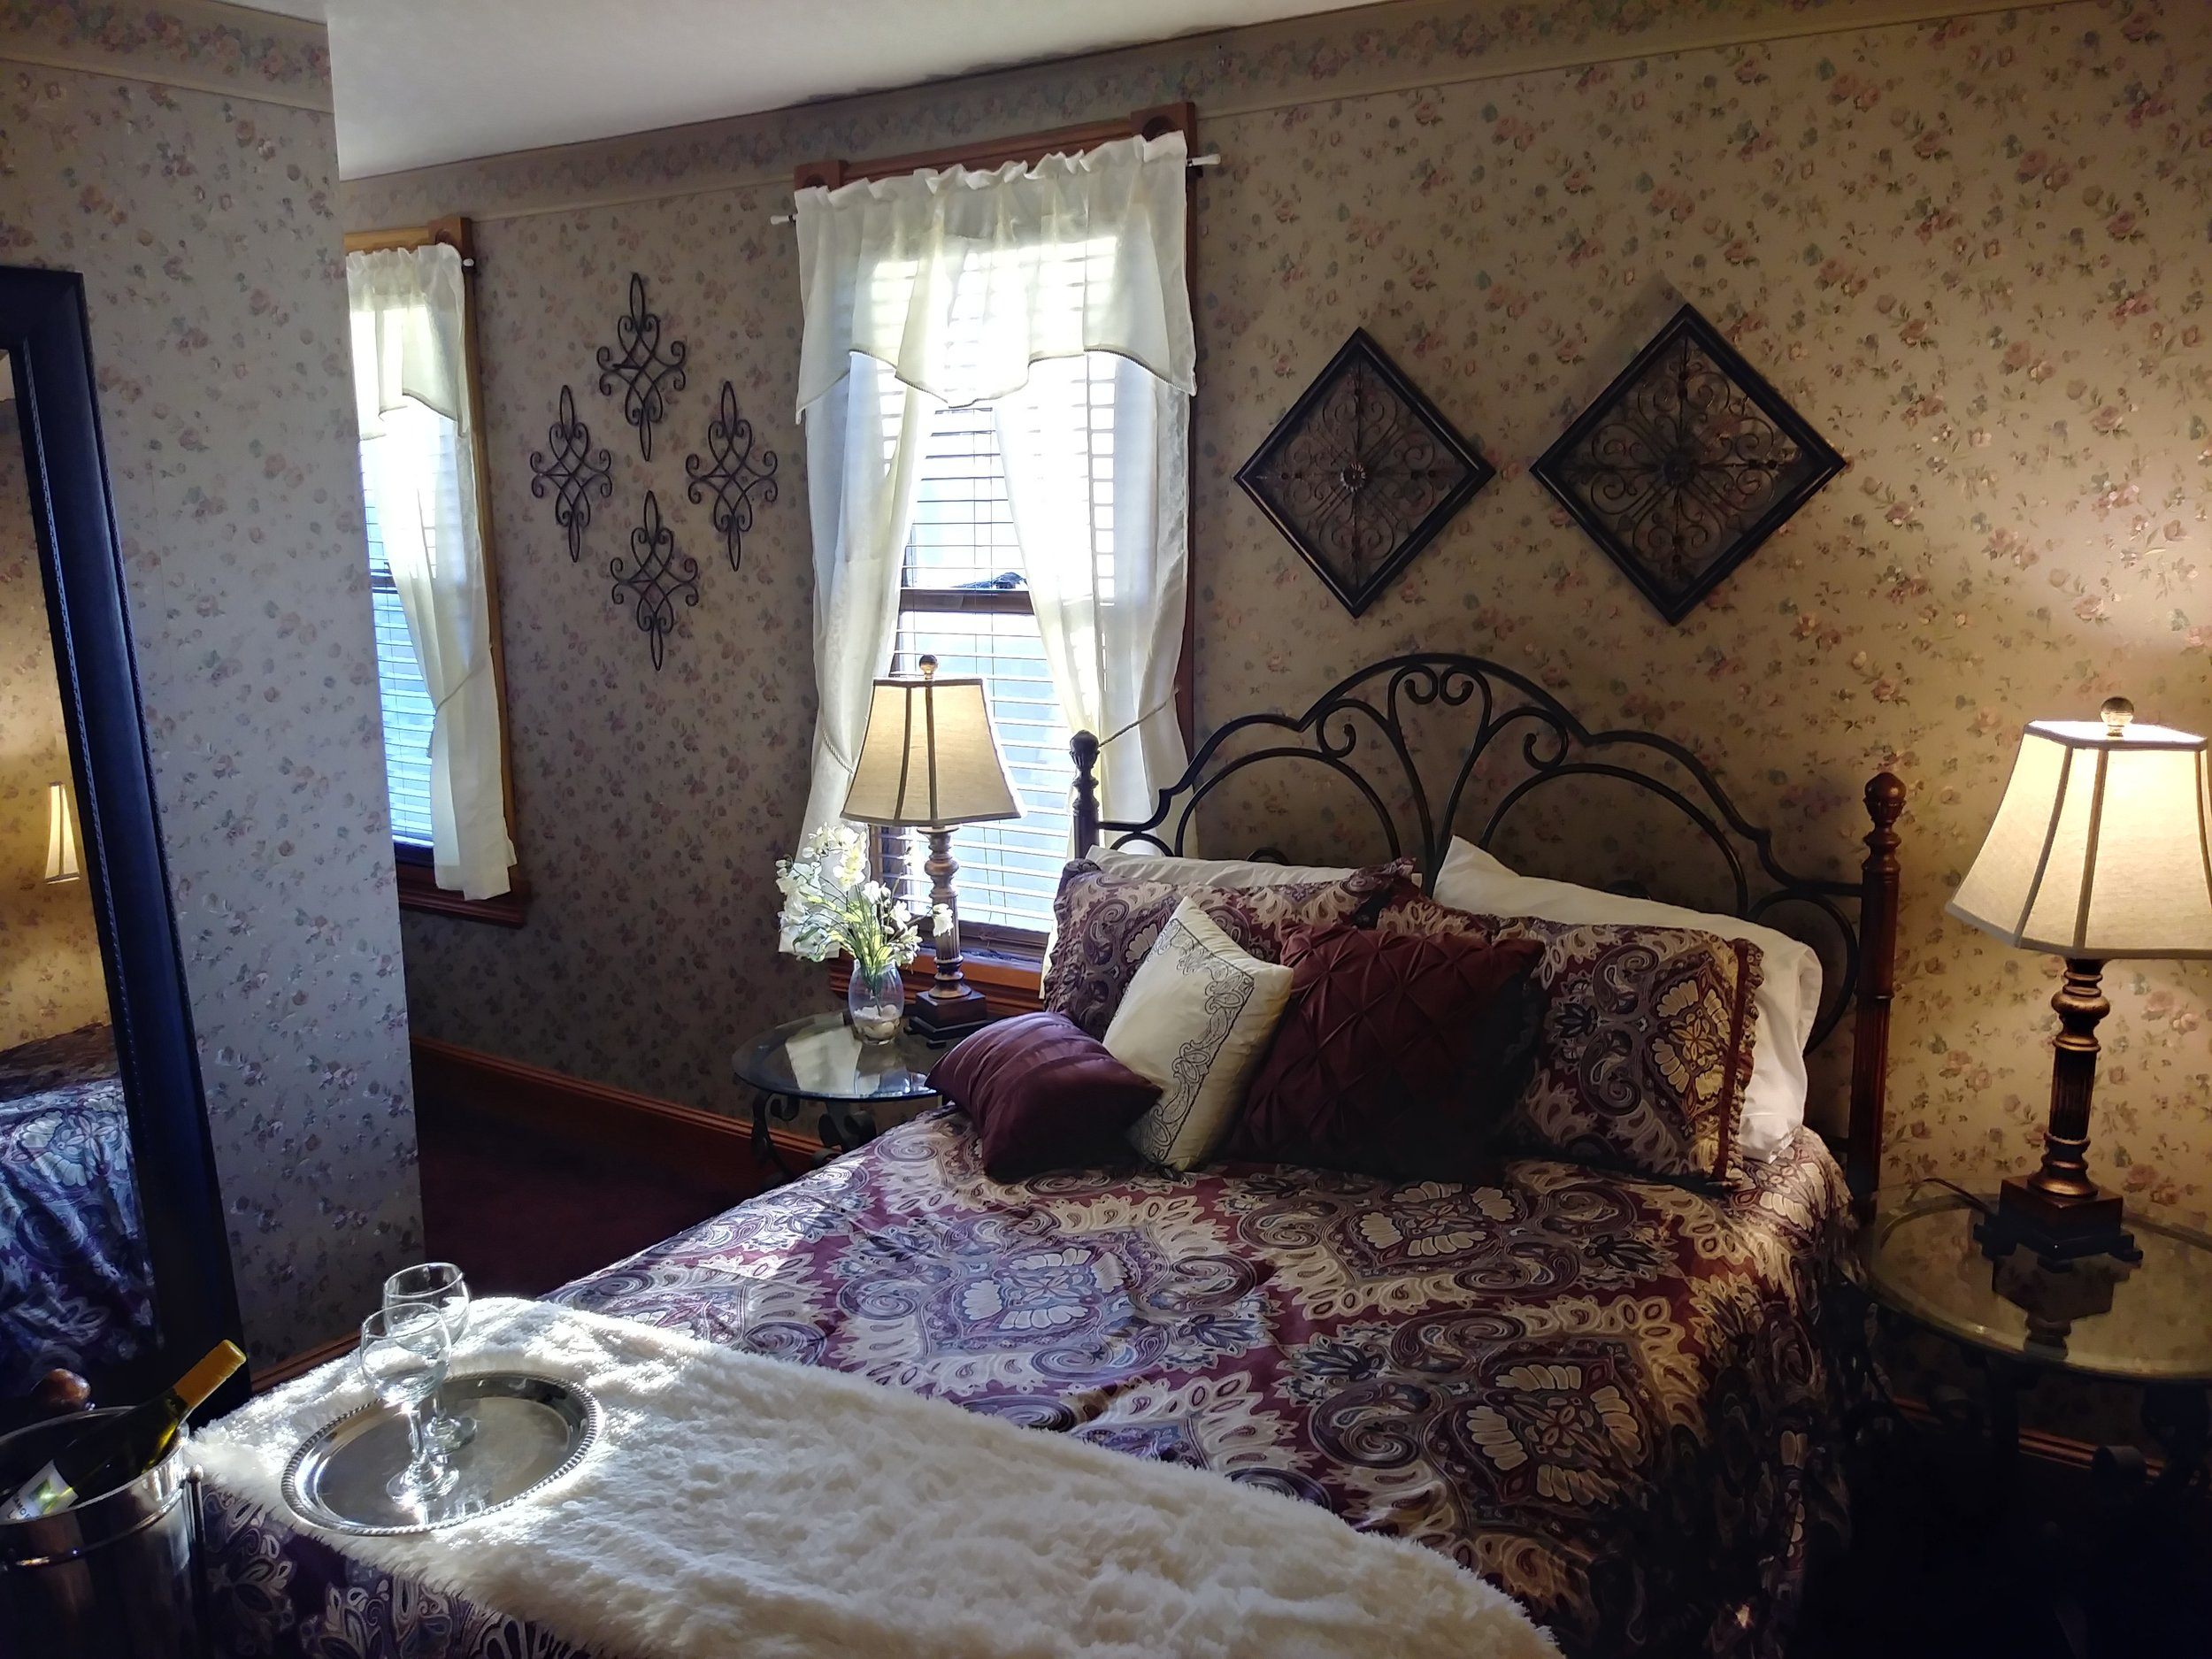 Room 306 10.jpg